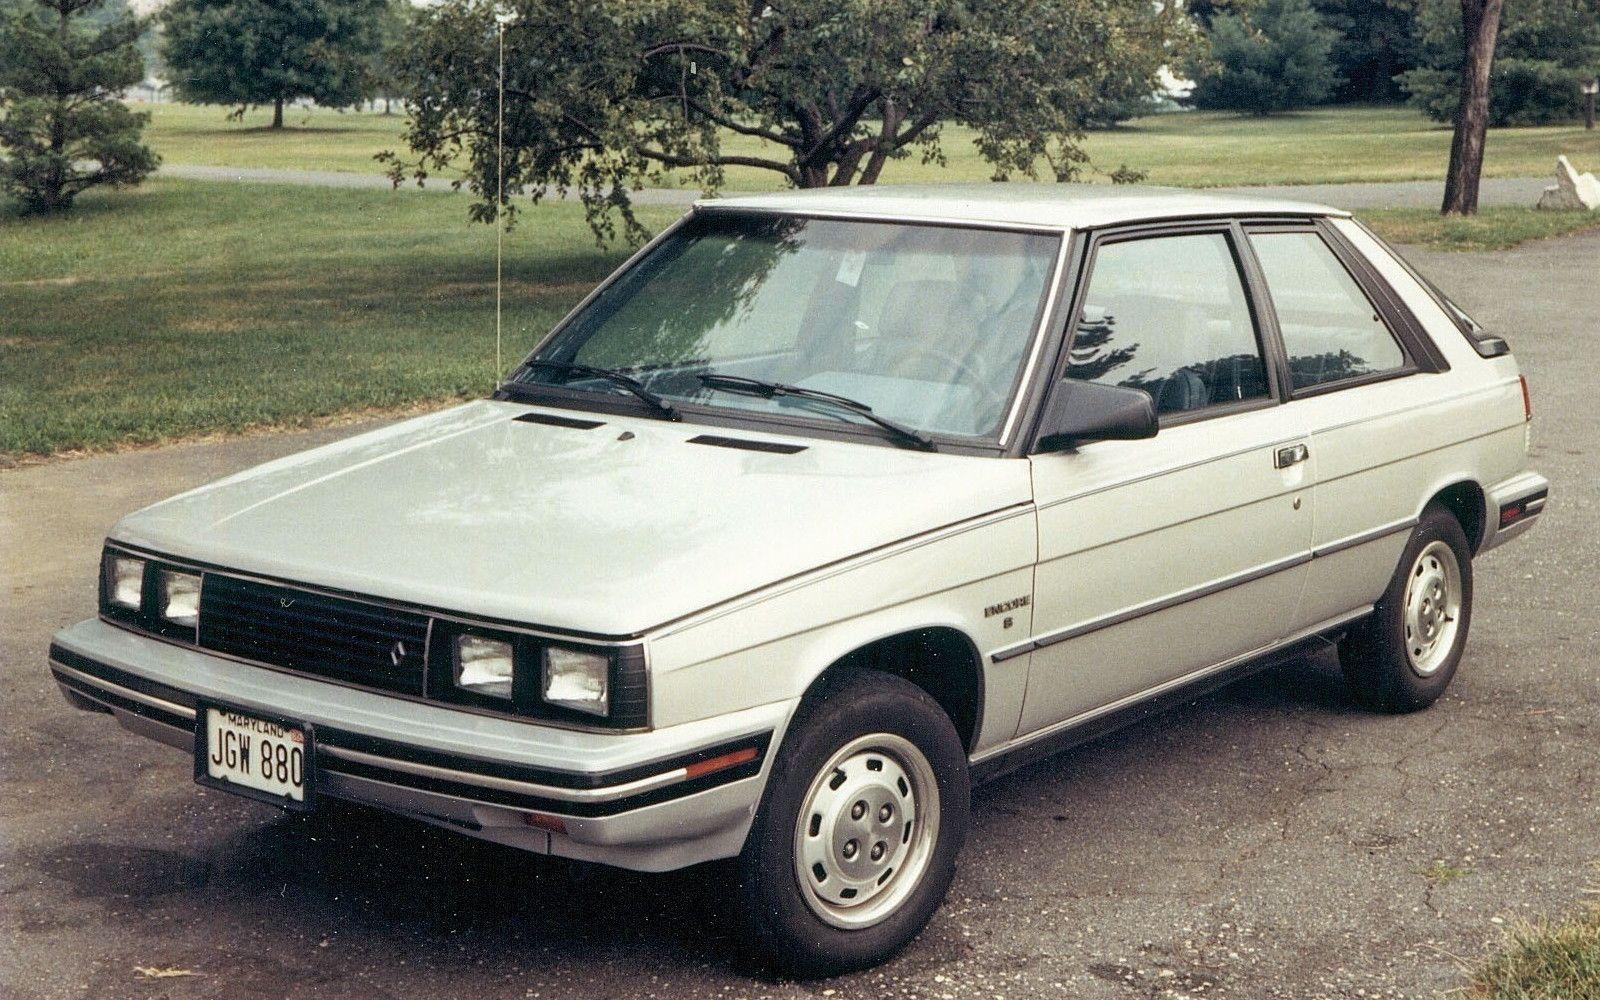 Pin by Lon Sullivan on Cars: Renault Alliance/Encore | Pinterest ...